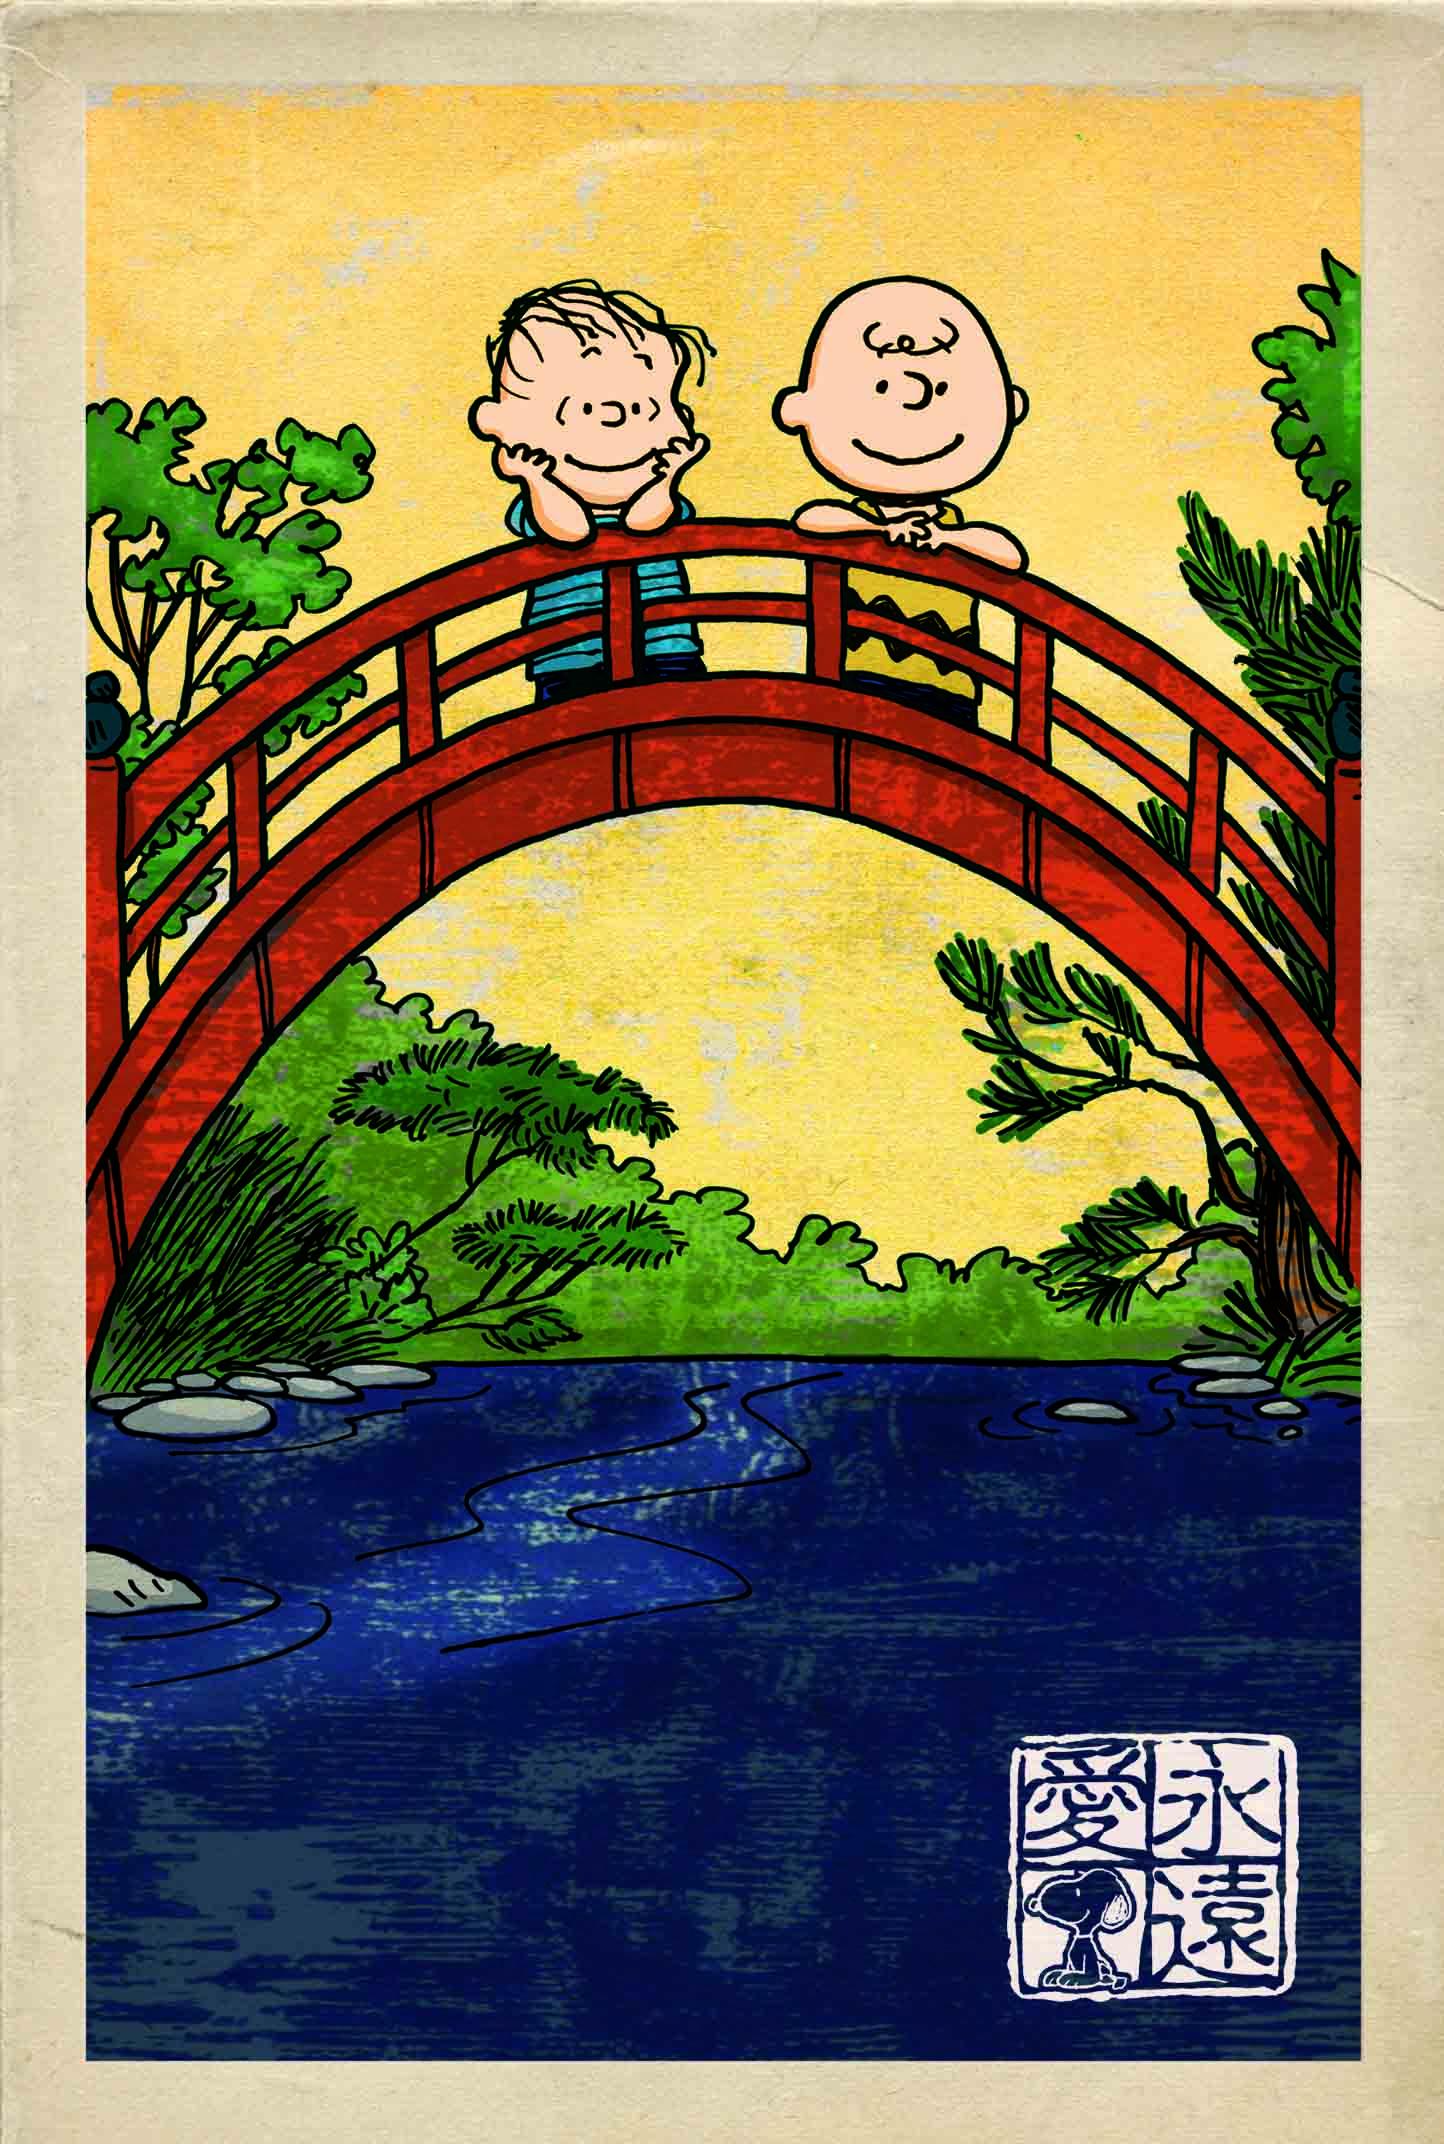 PeanutsComicCon2012postcard1.jpg